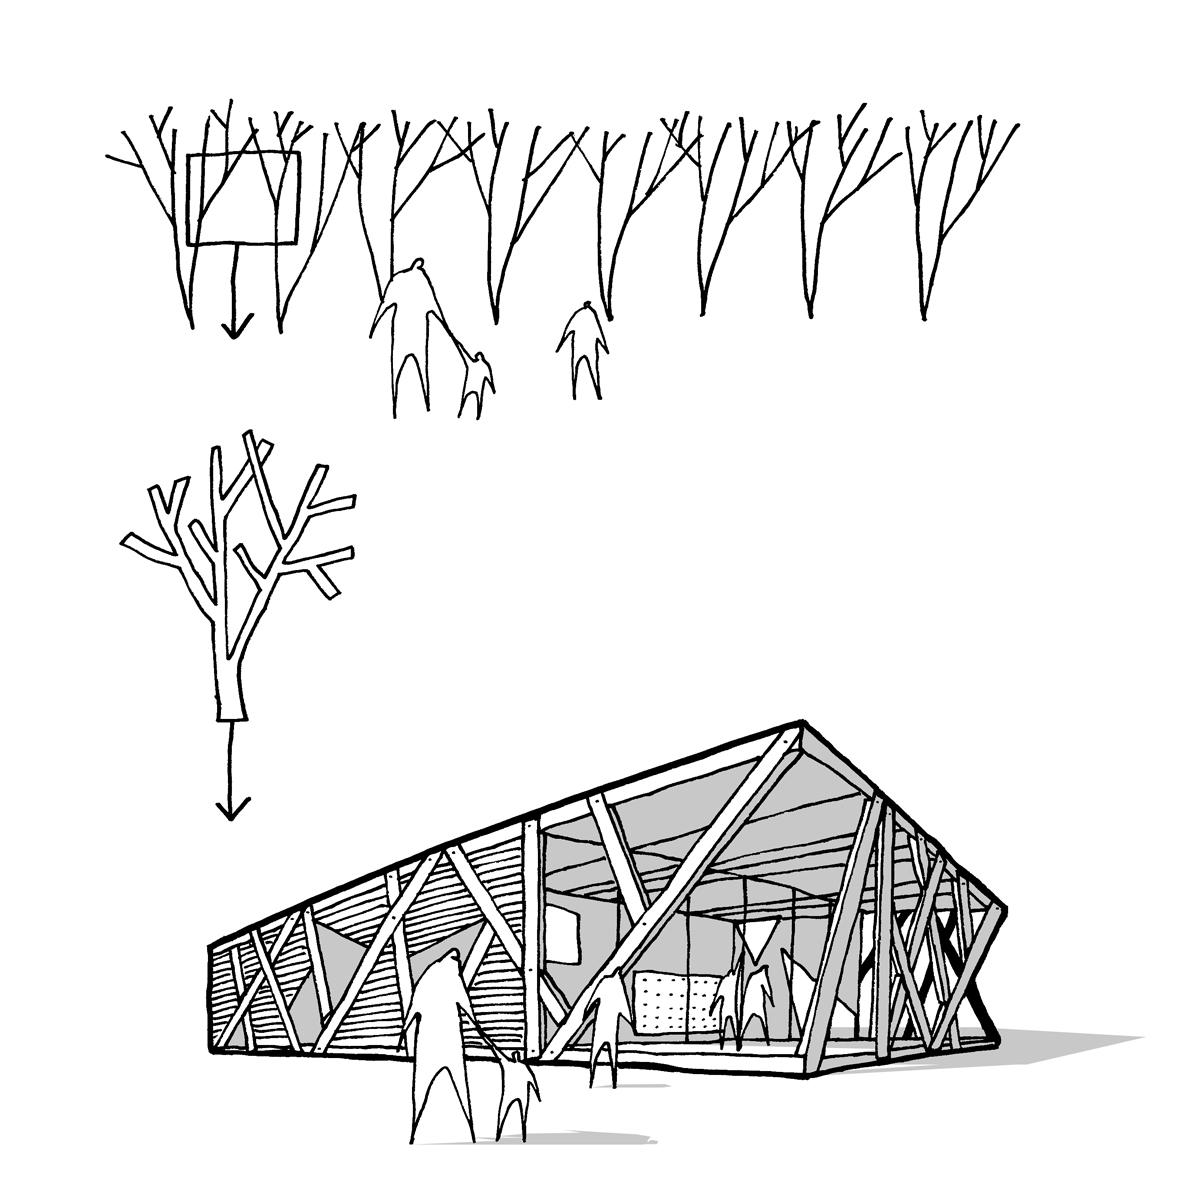 http://ad009cdnb.archdaily.net/wp-content/uploads/2013/11/528da19de8e44e536800018c_rebildporten-cebra_sketch_concept.png